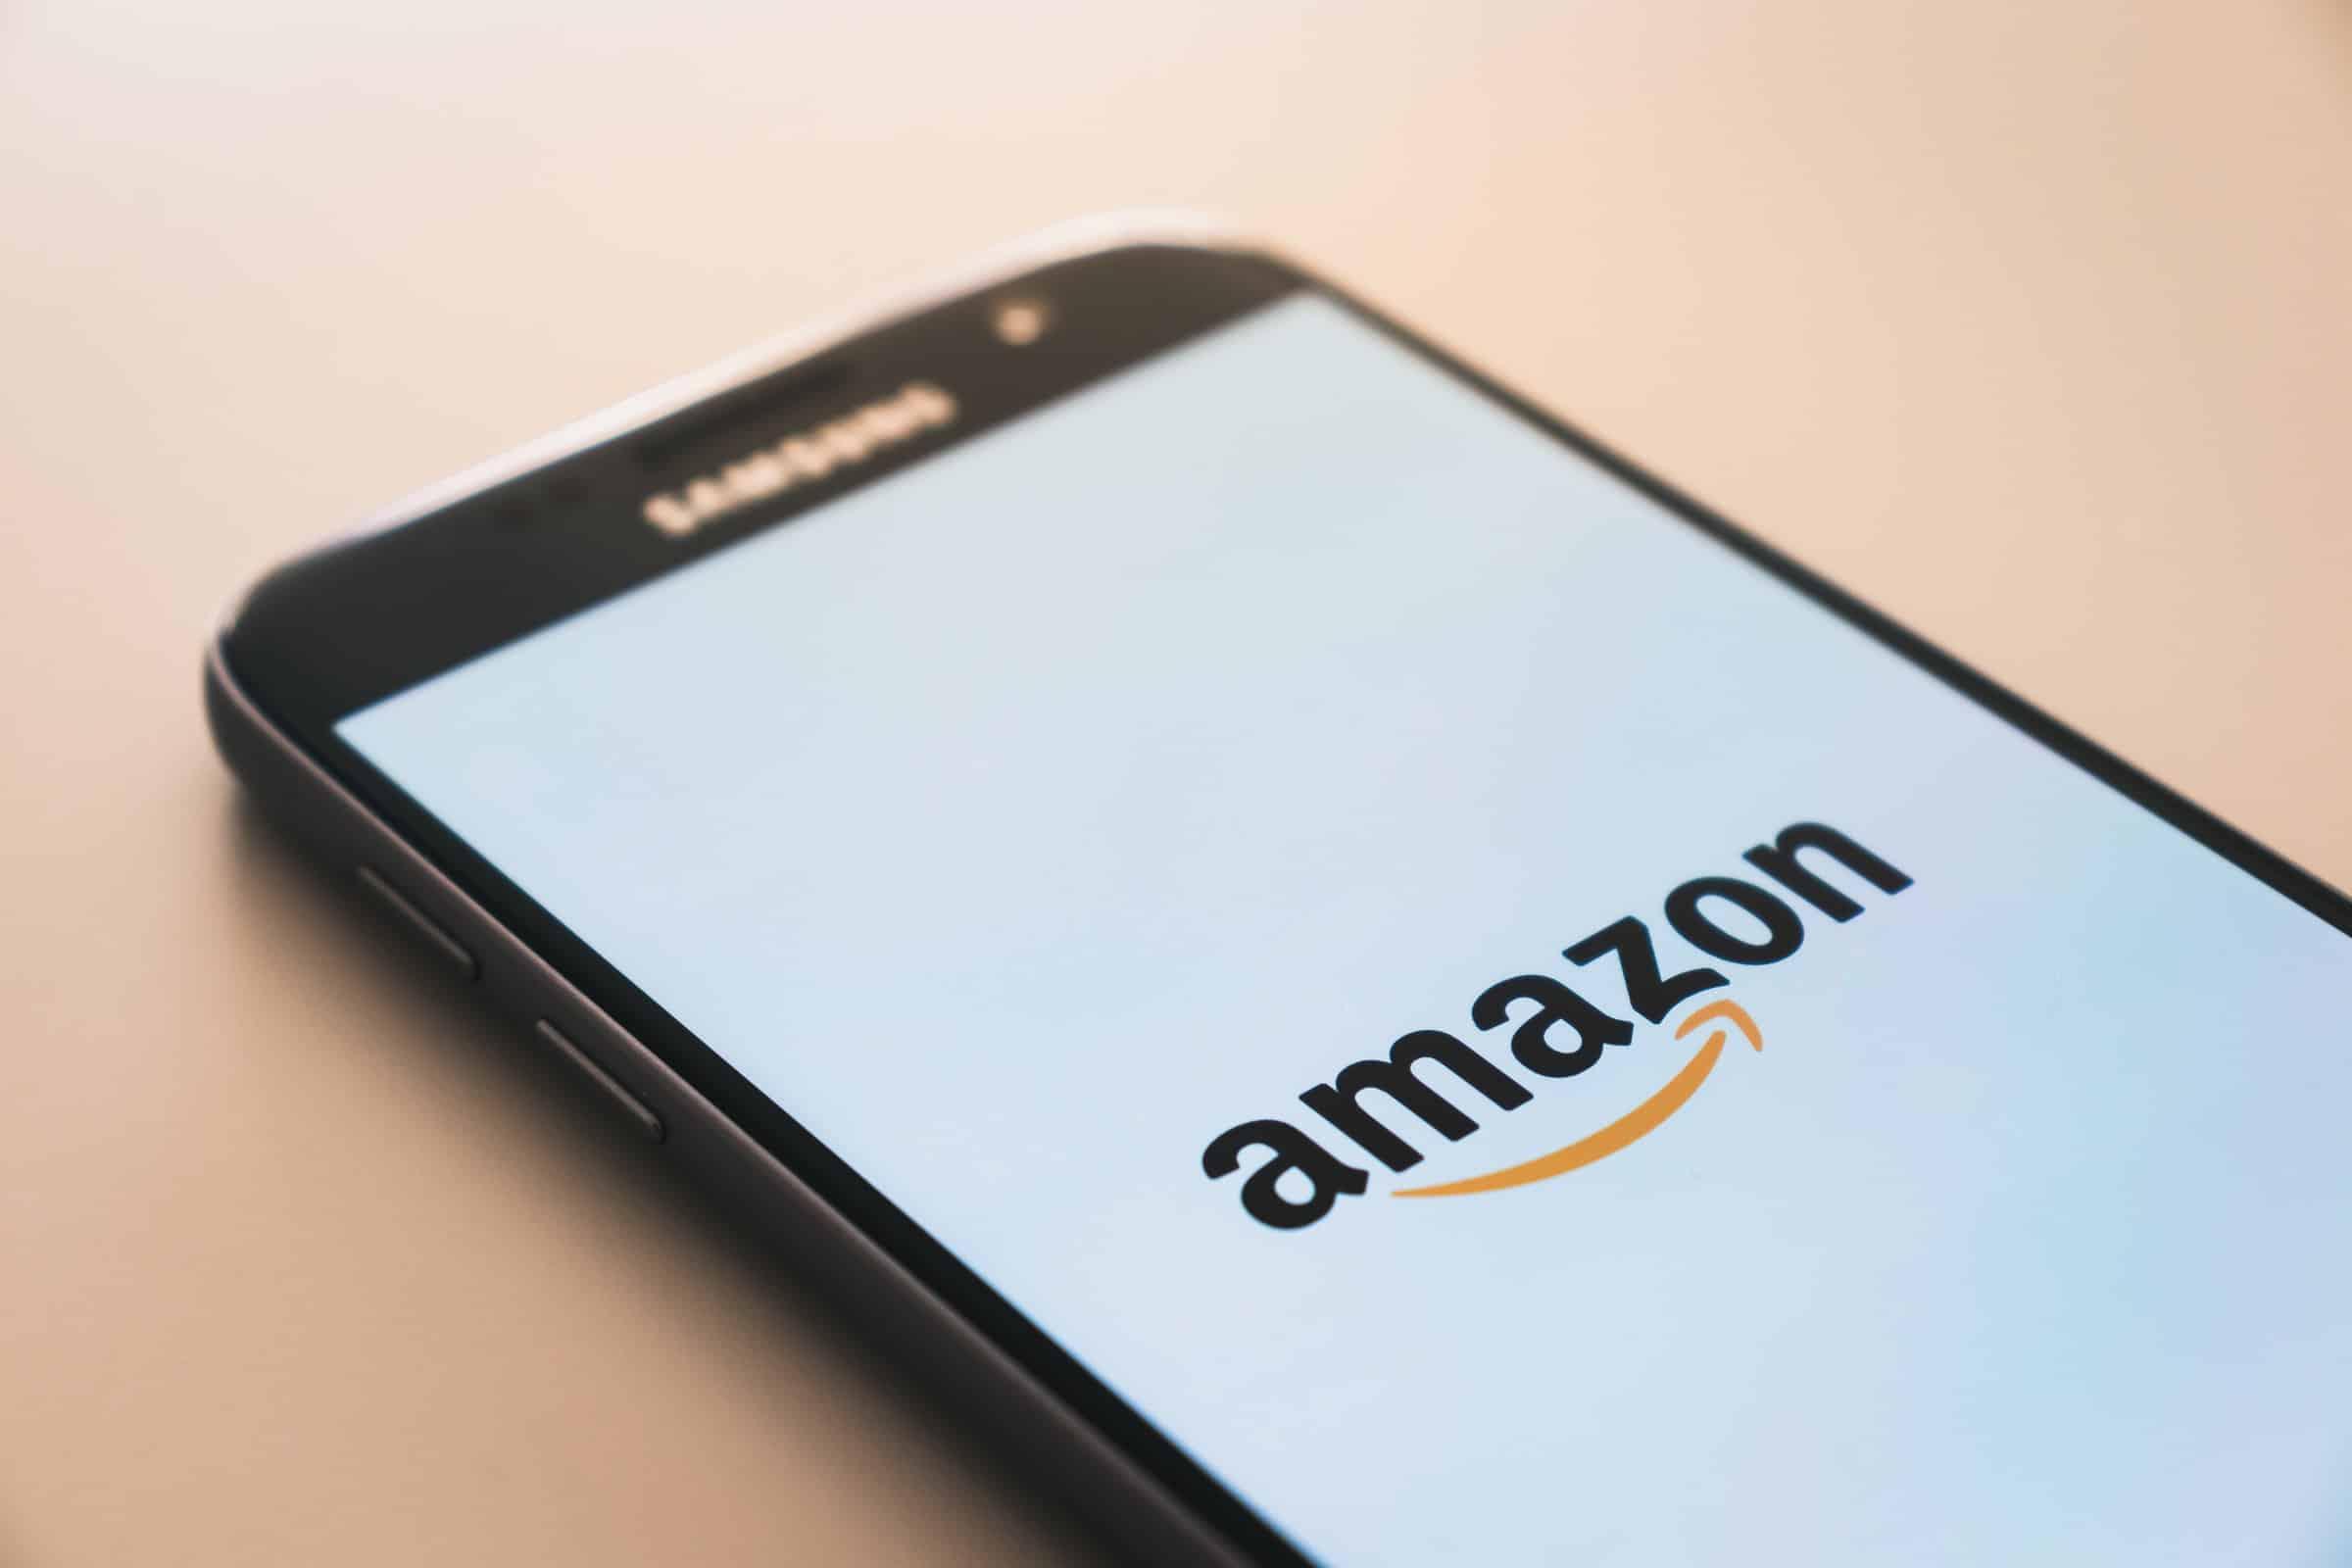 SIAC concludes 5-day long hearing Amazon-Future dispute